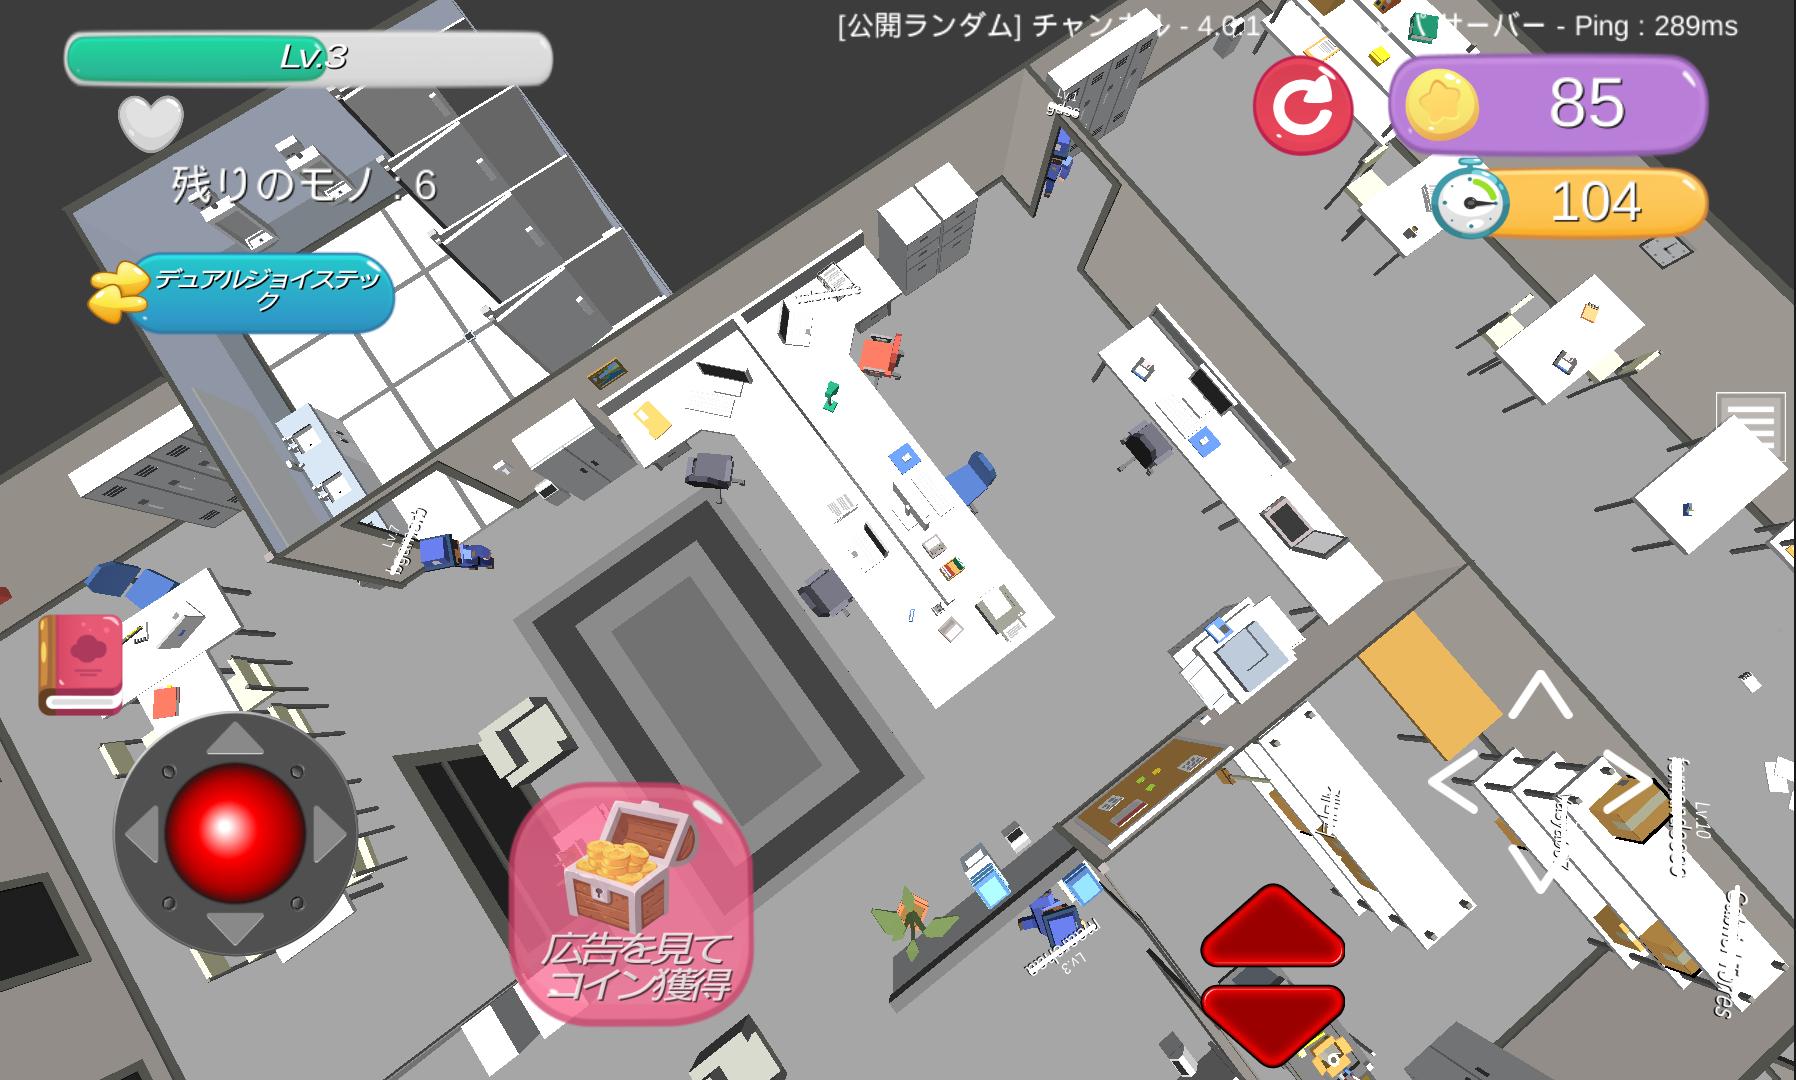 androidアプリ 隠れん坊 オンライン攻略スクリーンショット3